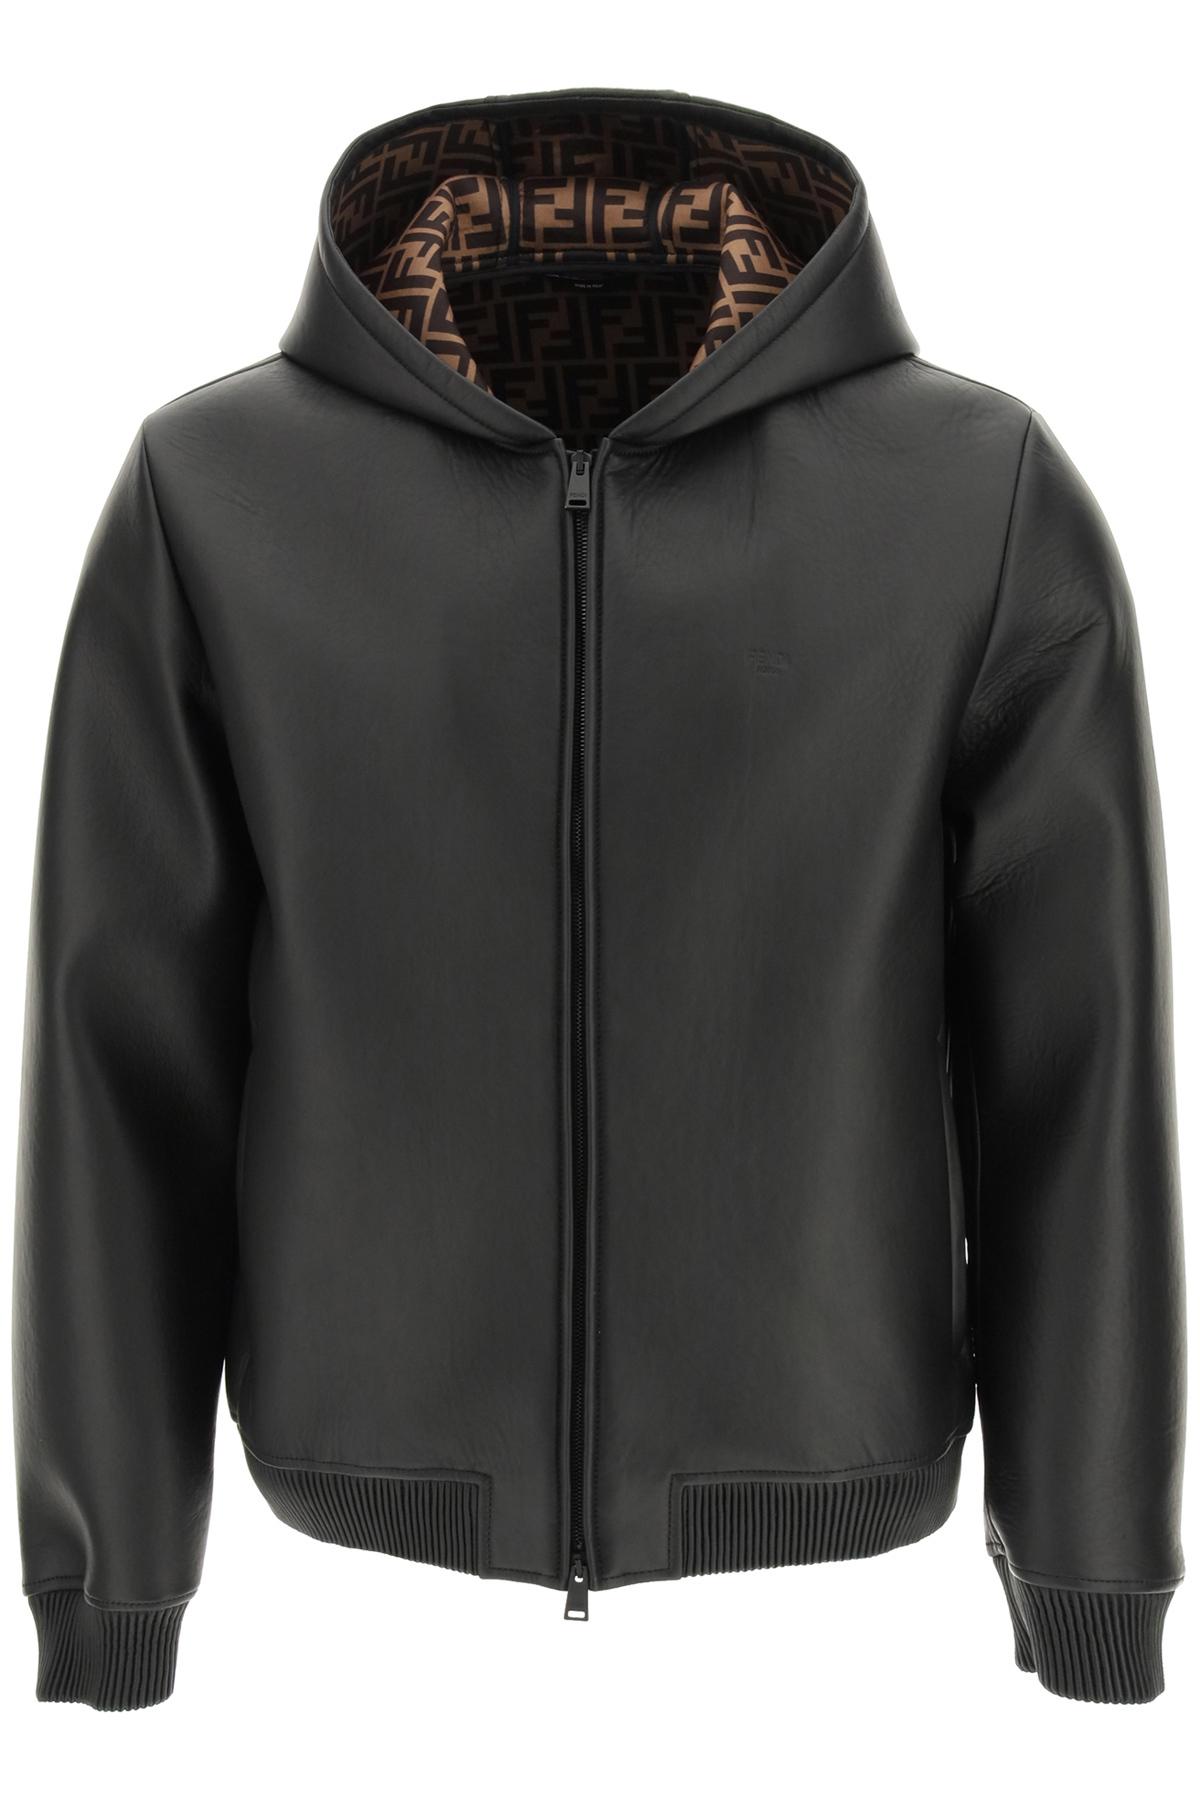 Fendi giacca in pelle